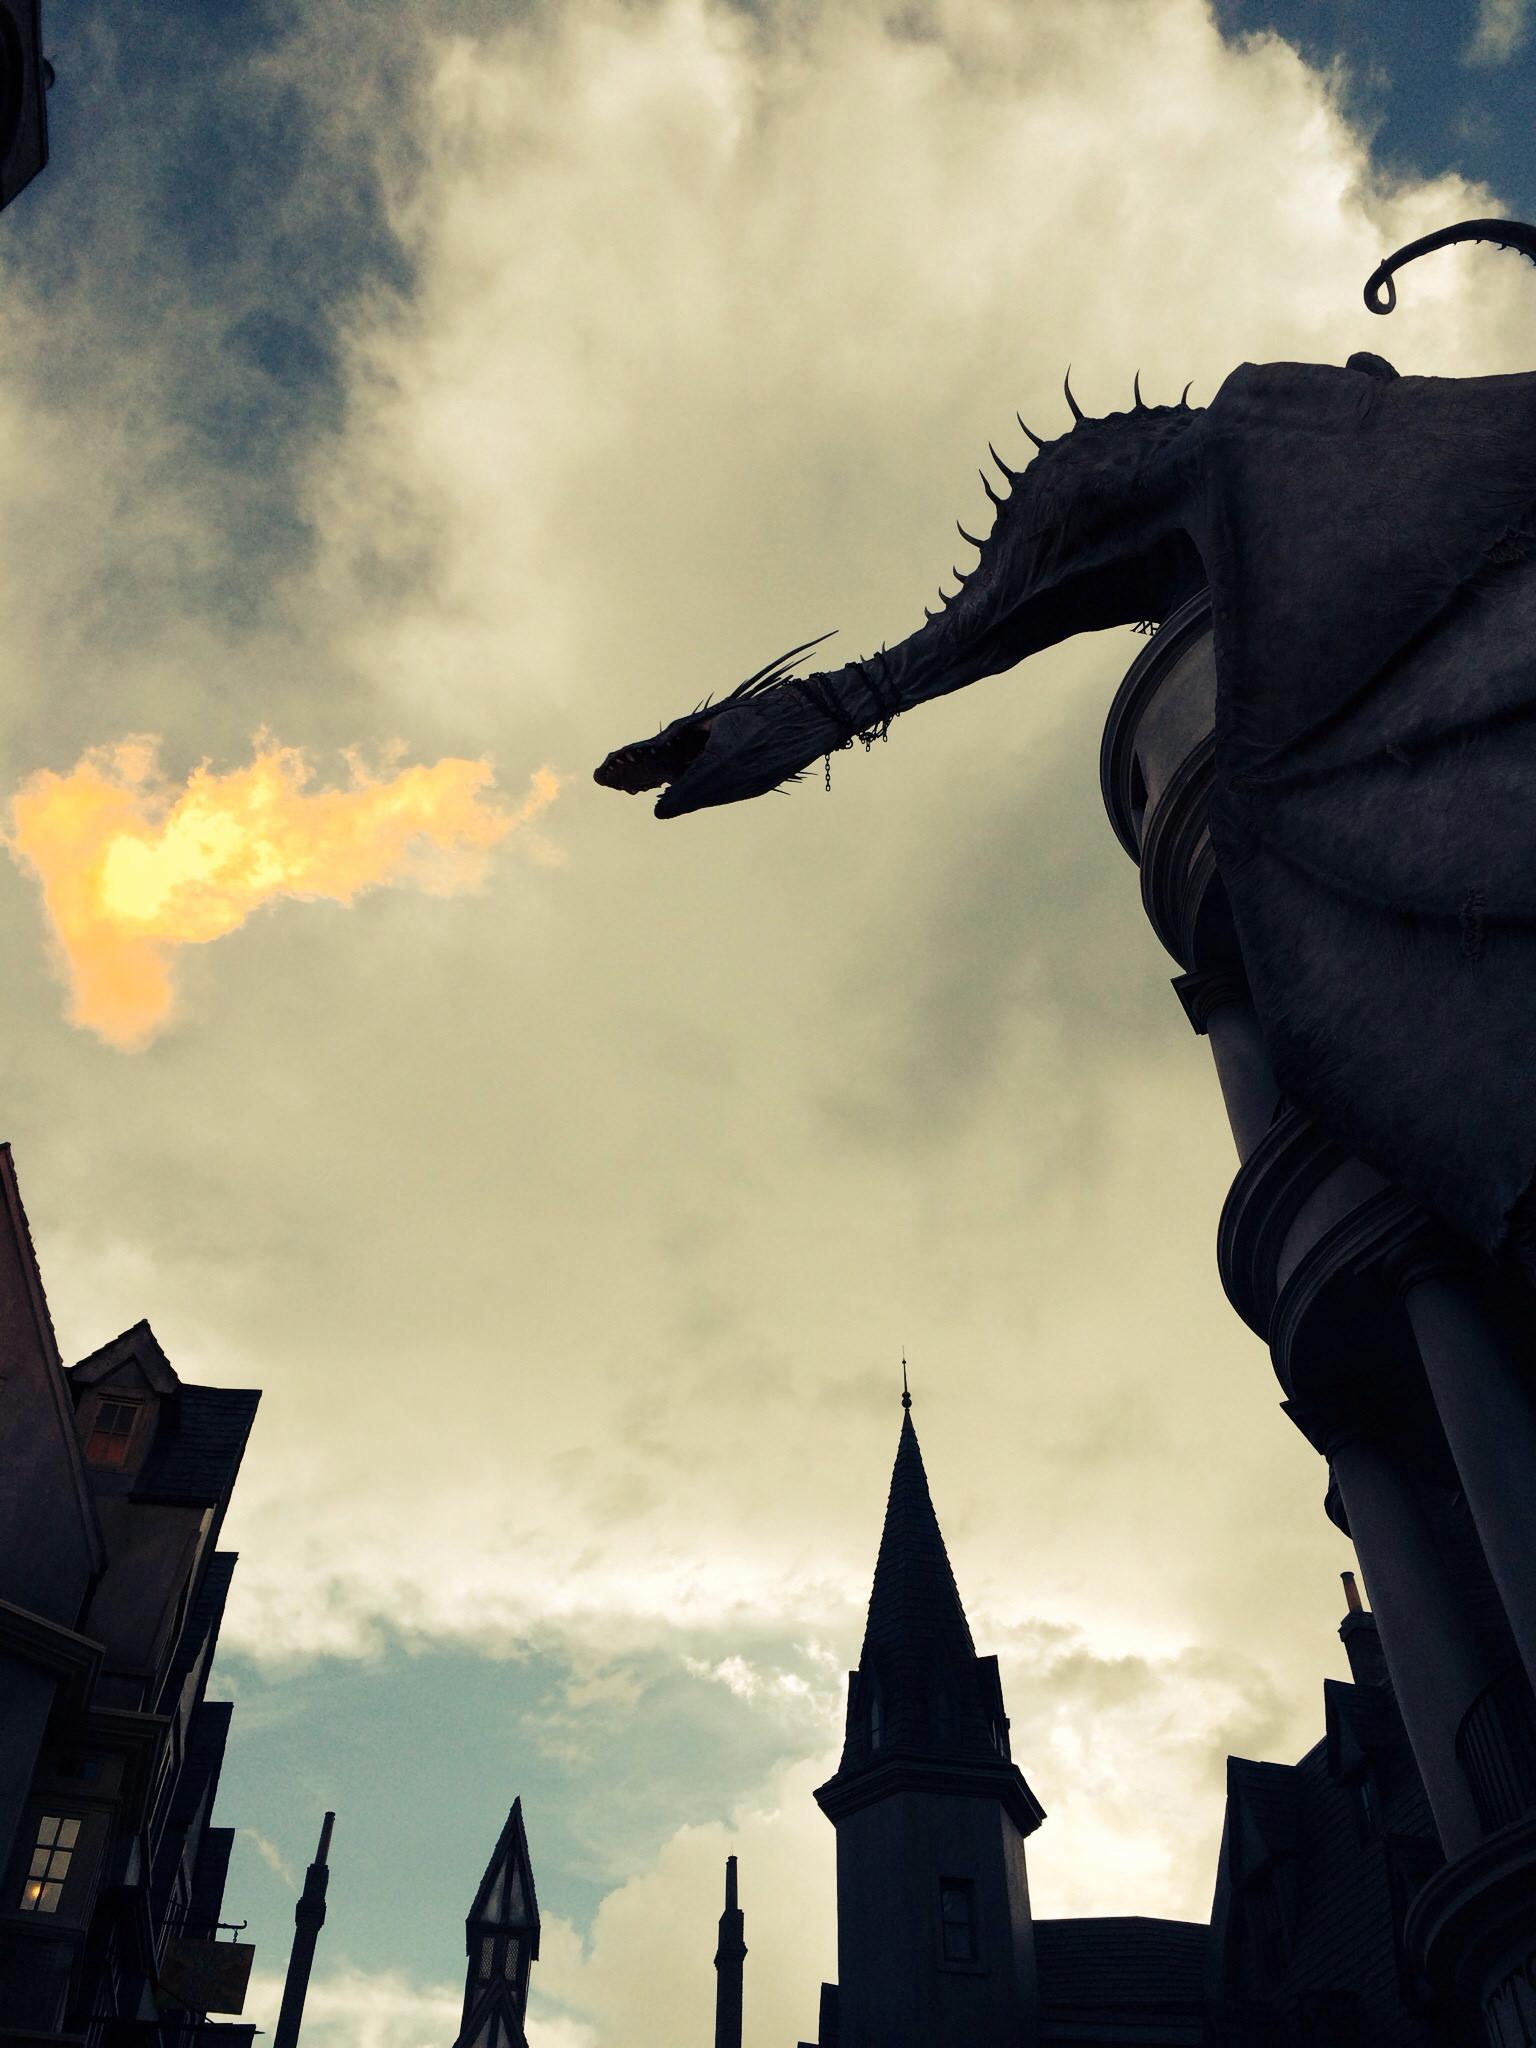 fire breathing dragon on Gringotts bank